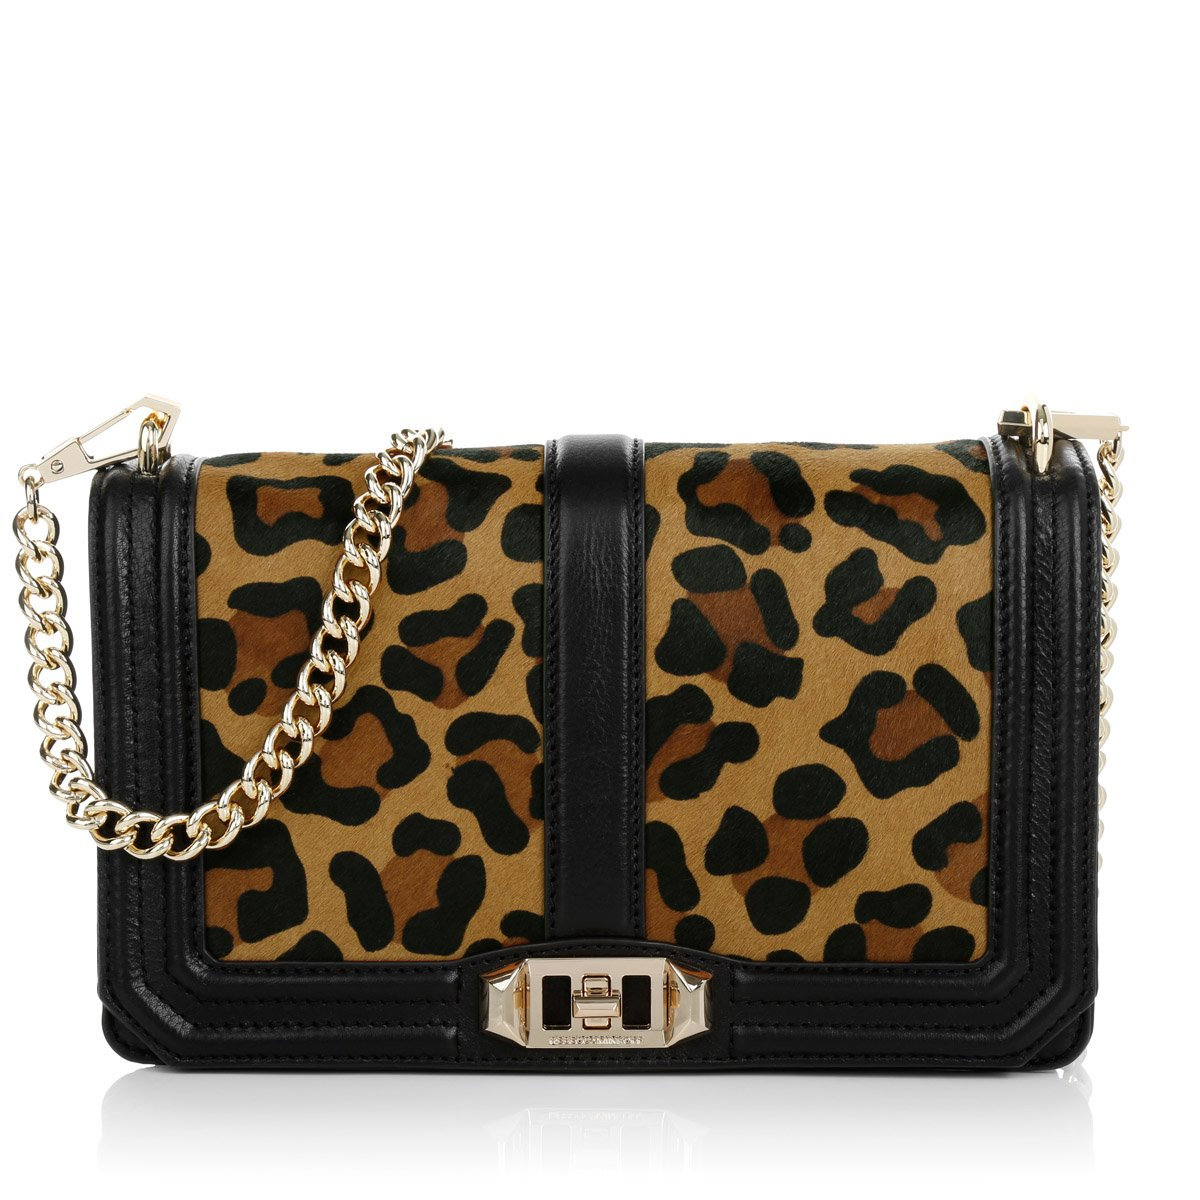 Rebecca Minkoff Love Cross Body Bag, Leopard, One Size